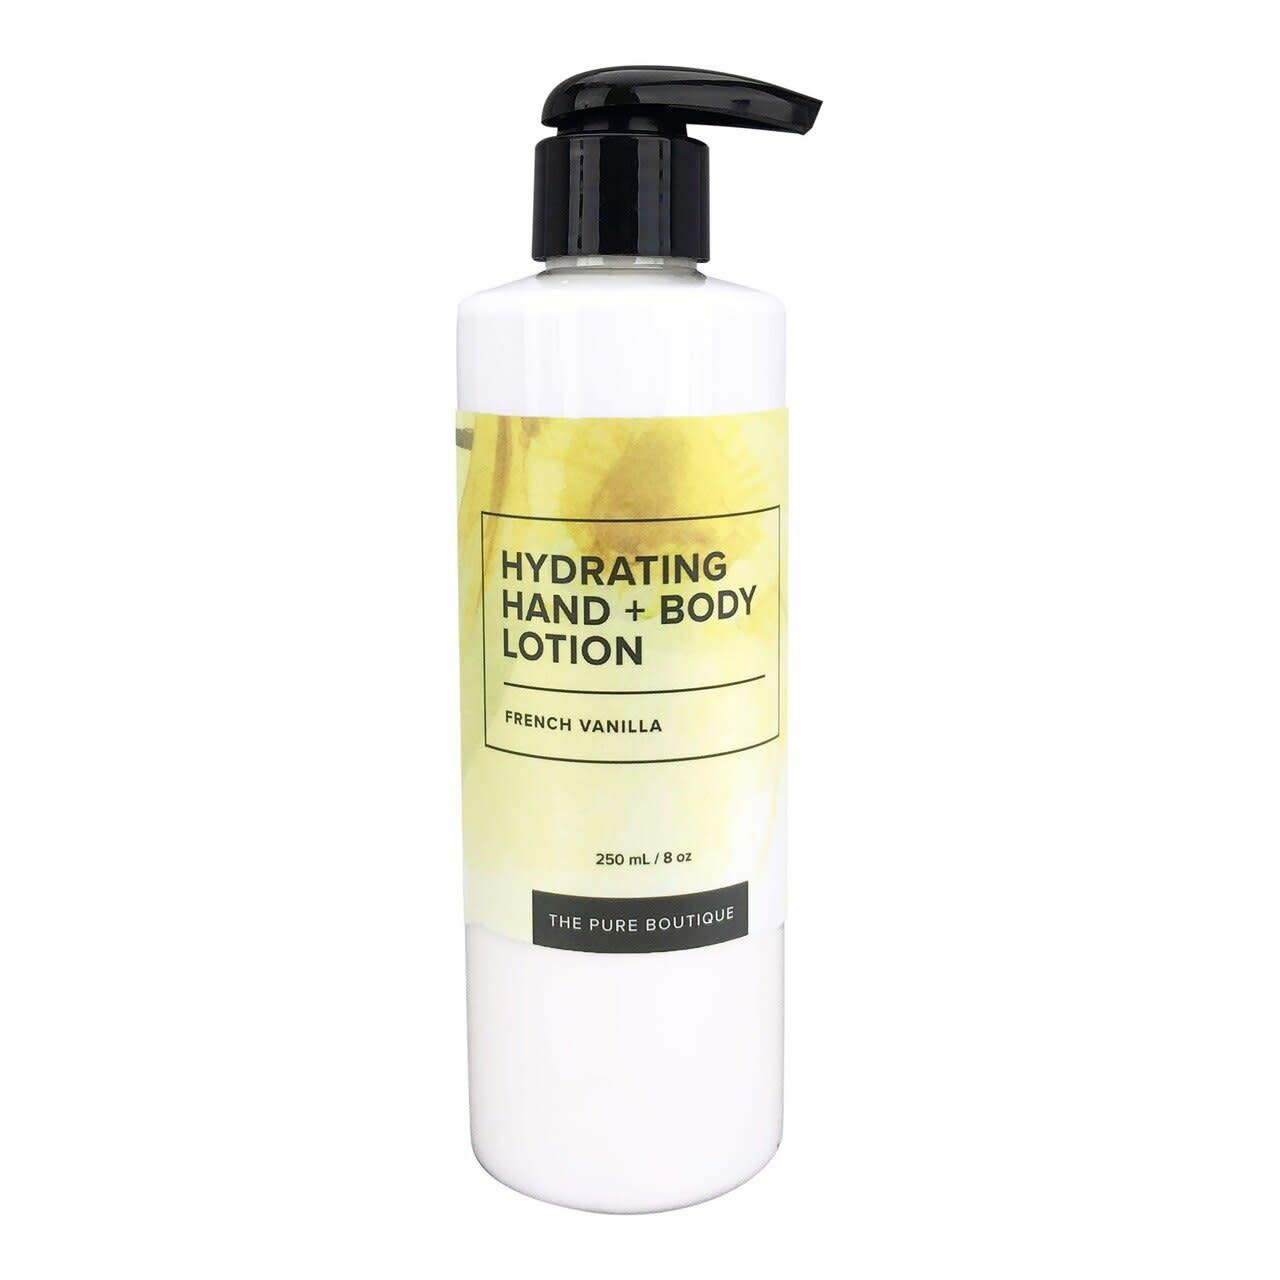 Hydrating Hand & Body Lotion - French Vanilla-1